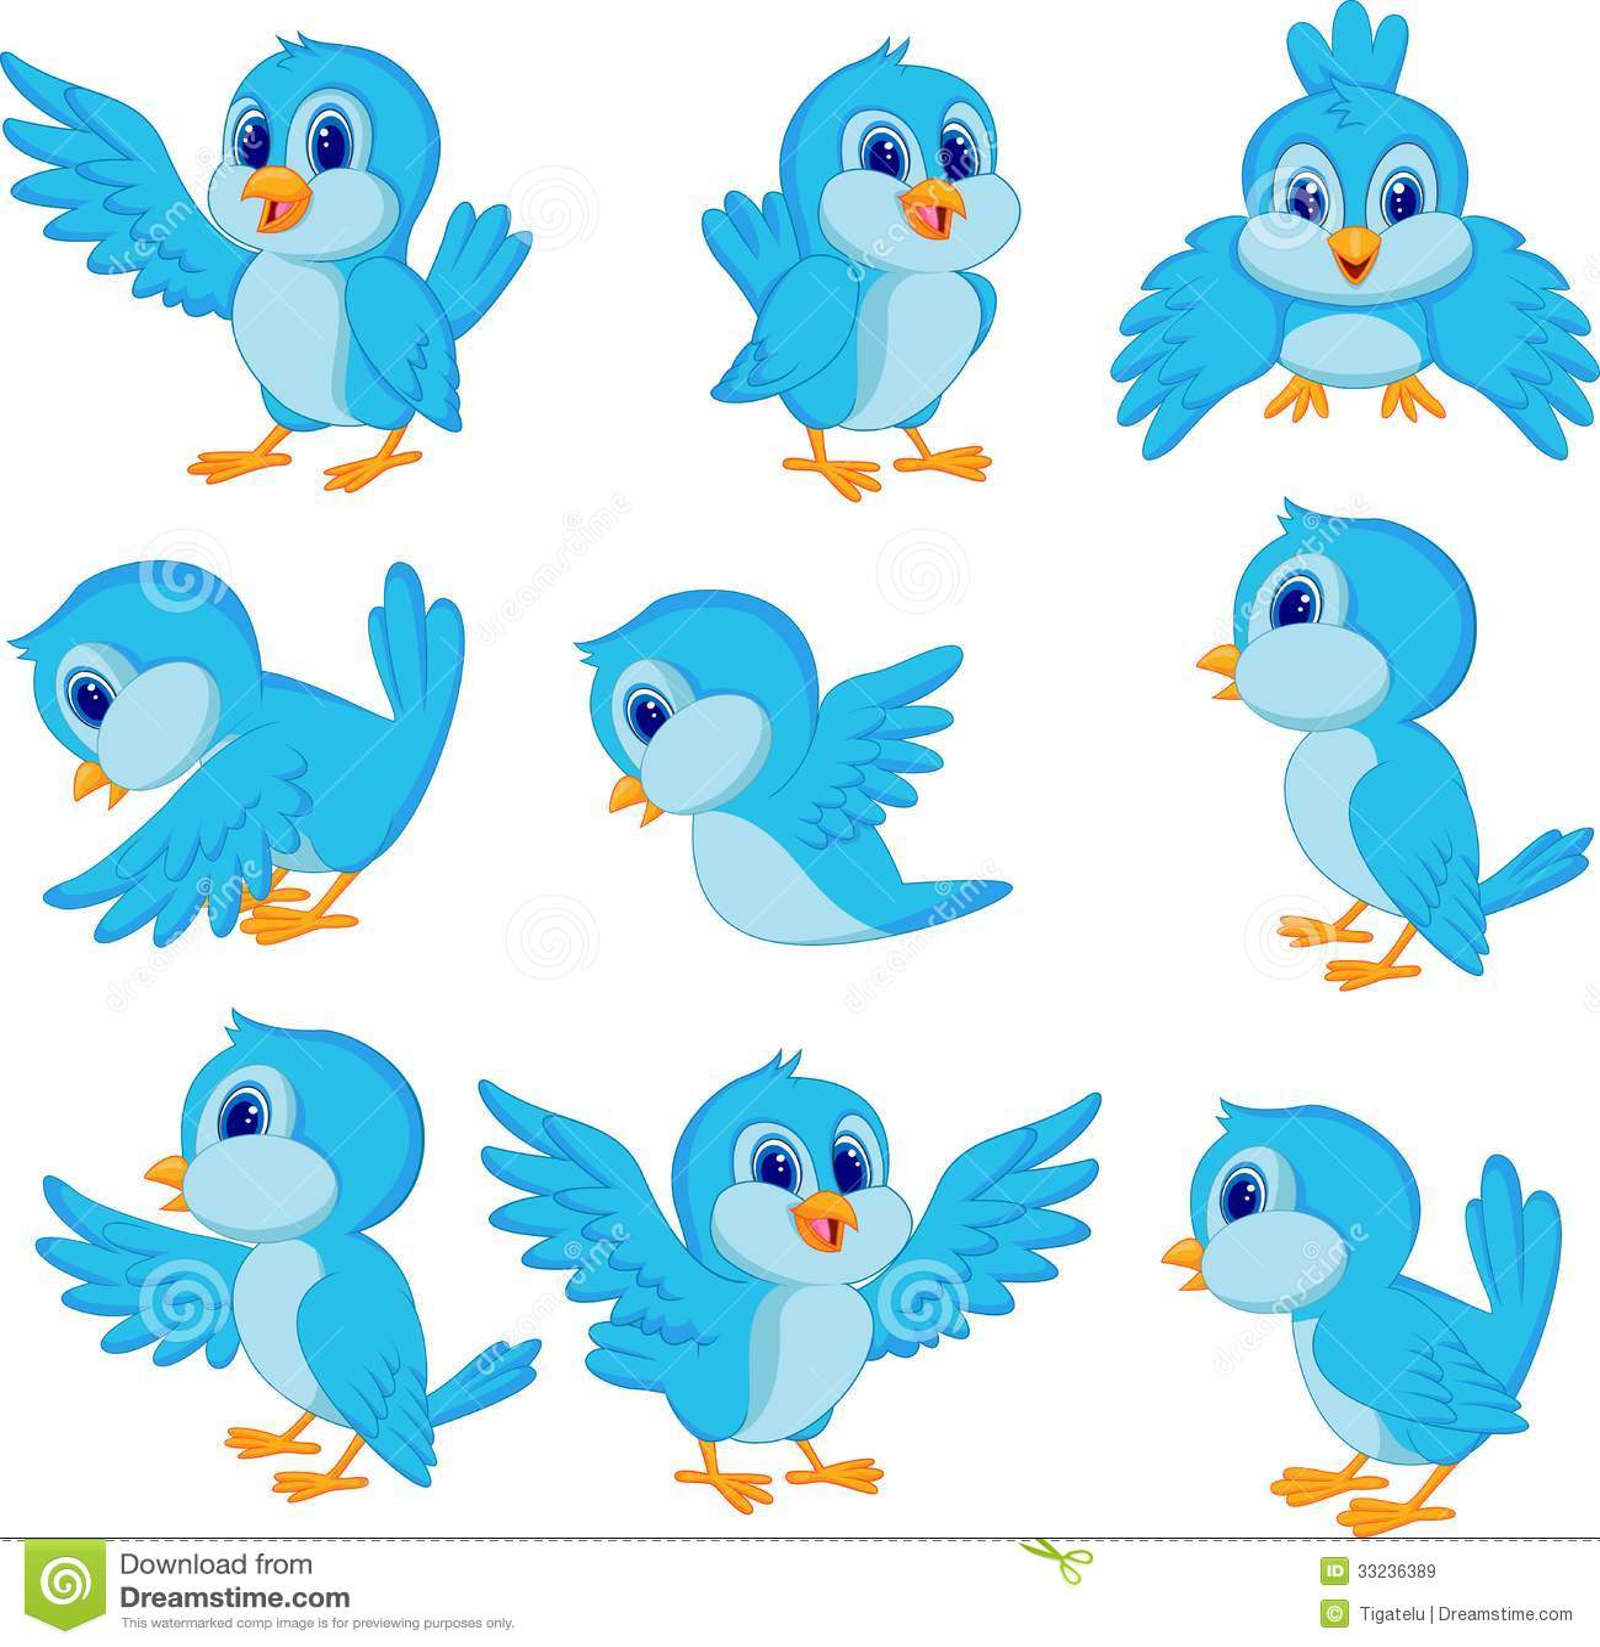 cute blue bird cartoon stock vector. illustration of funny - 33236389, Powerpoint templates